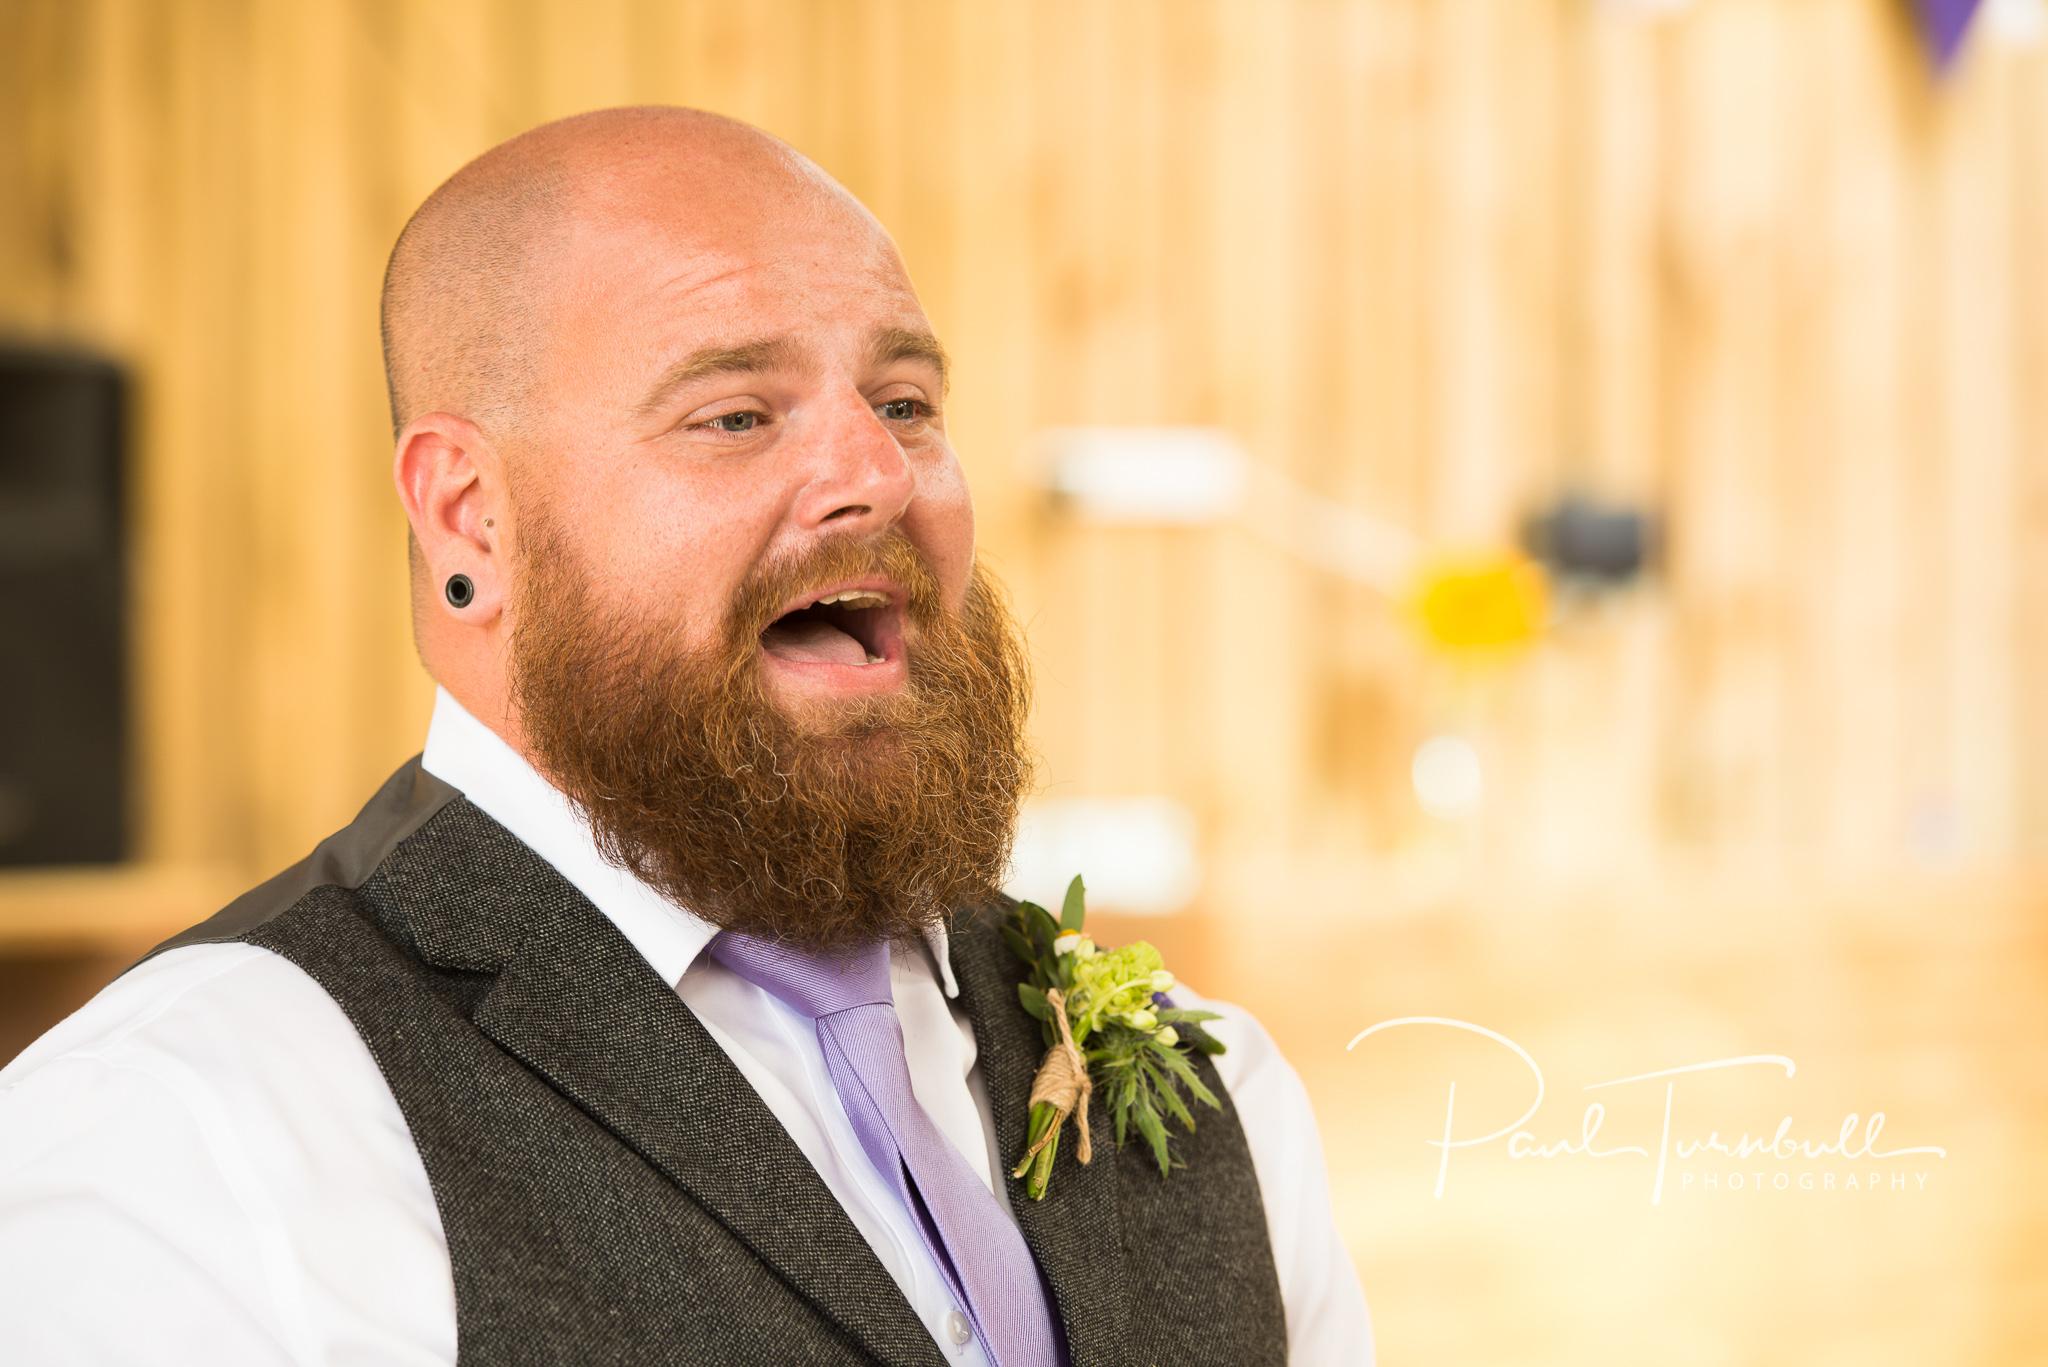 wedding-photographer-hilltop-farm-ilton-yorkshire-042.jpg